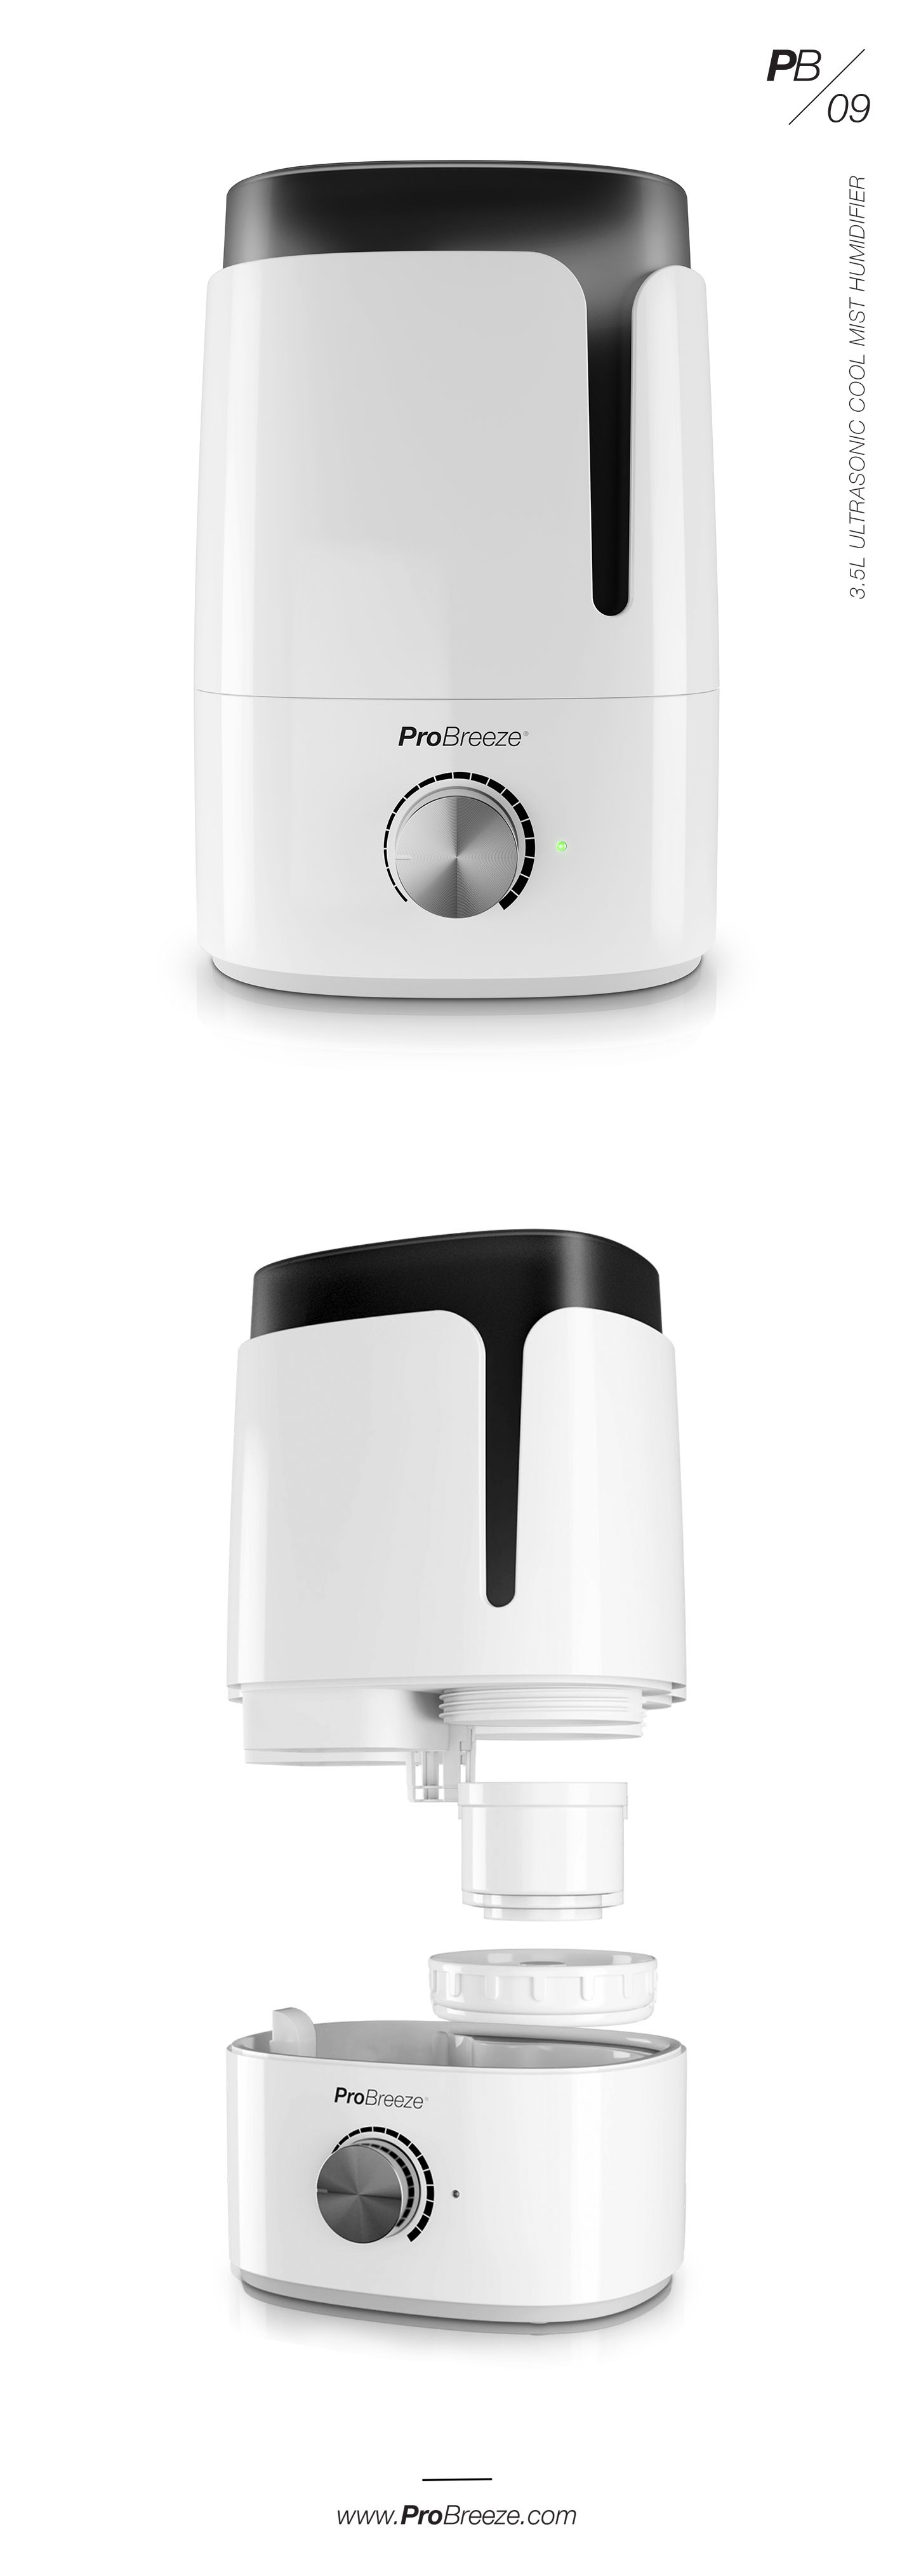 3.5 Litre Ultrasonic Humidifier Ultrasonic cool mist